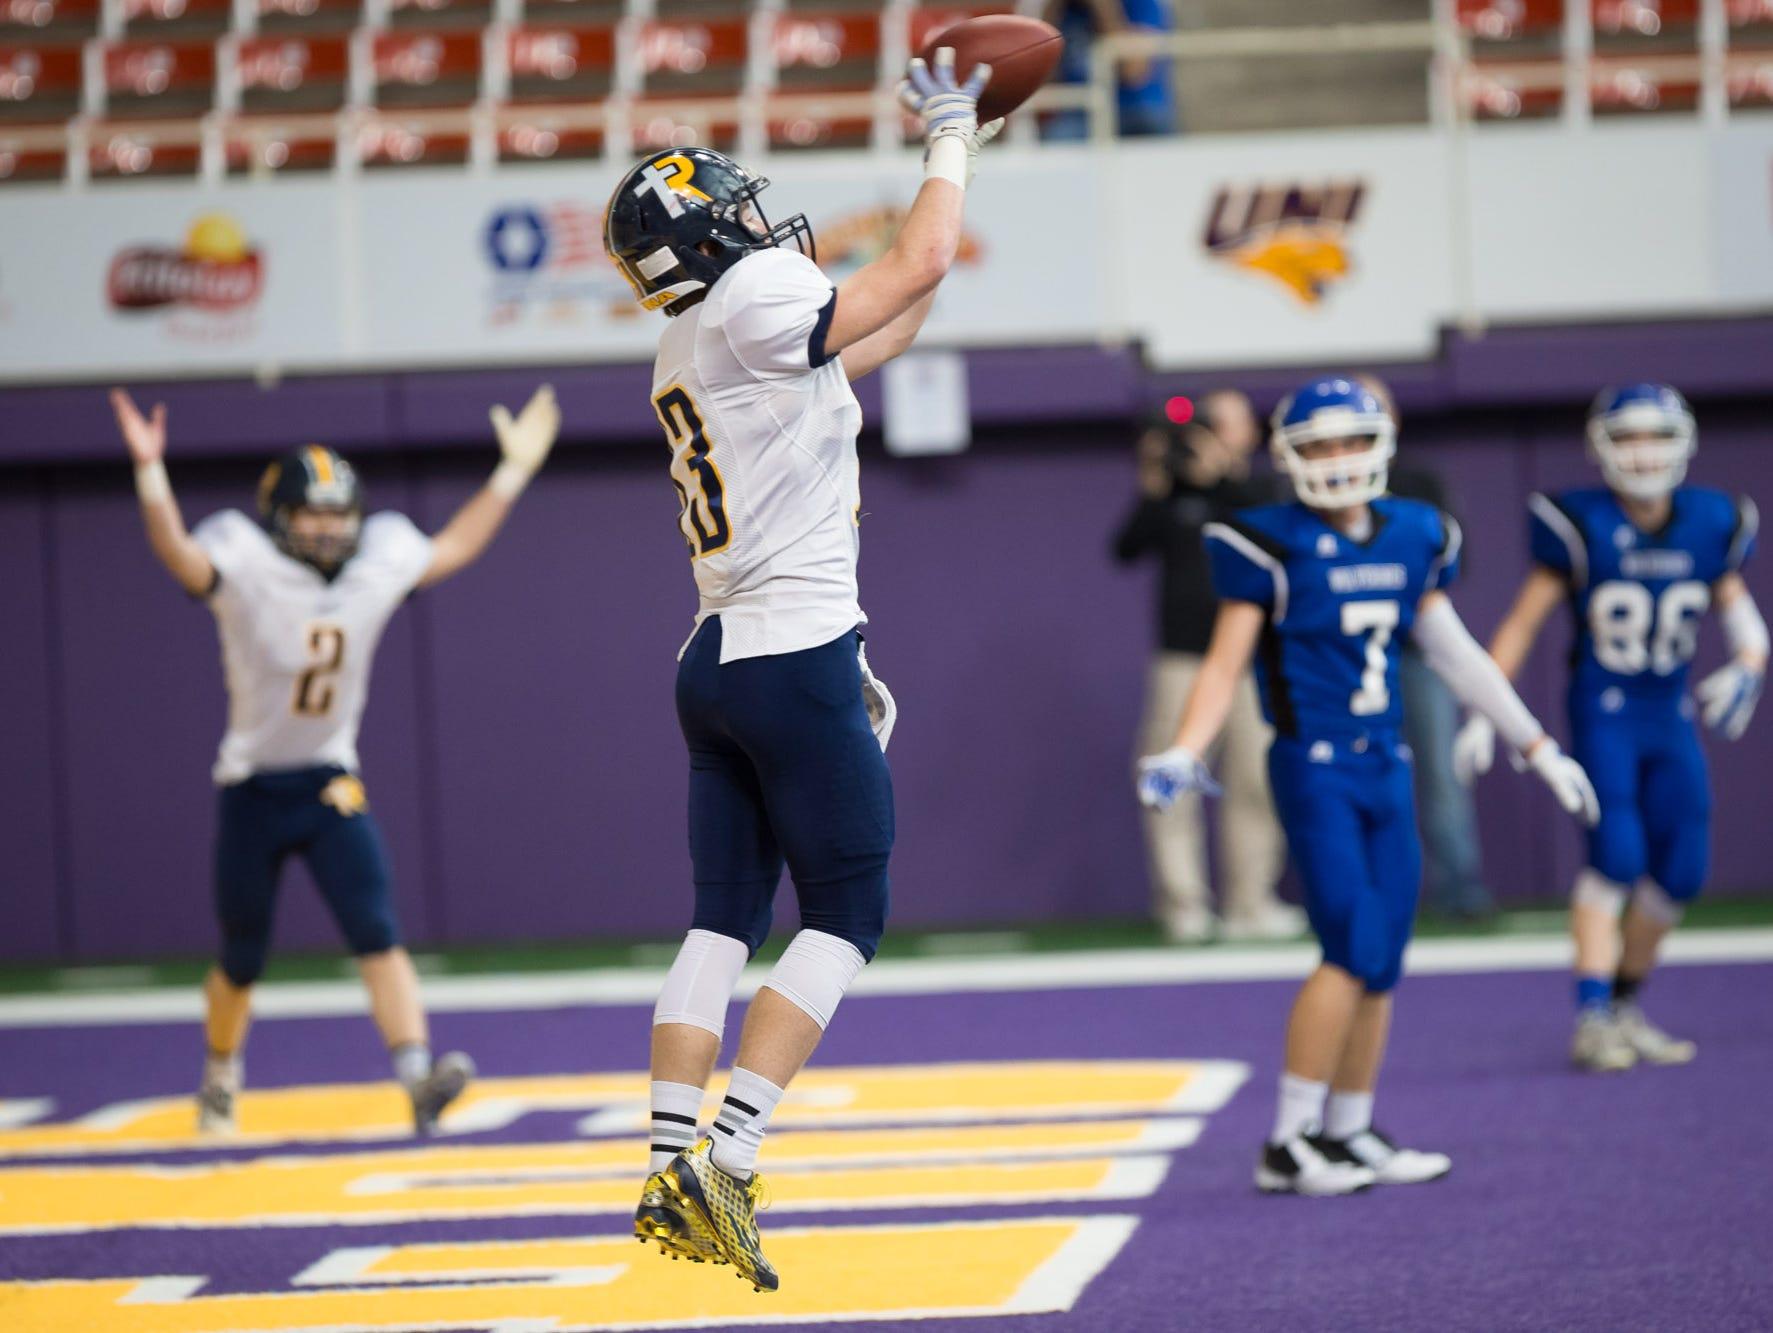 Iowa City Regina wide receiver Ethan Suchomel (13) catches a touchdown pass Saturday, Nov. 14, 2015 at the UNI Dome in Cedar Falls.